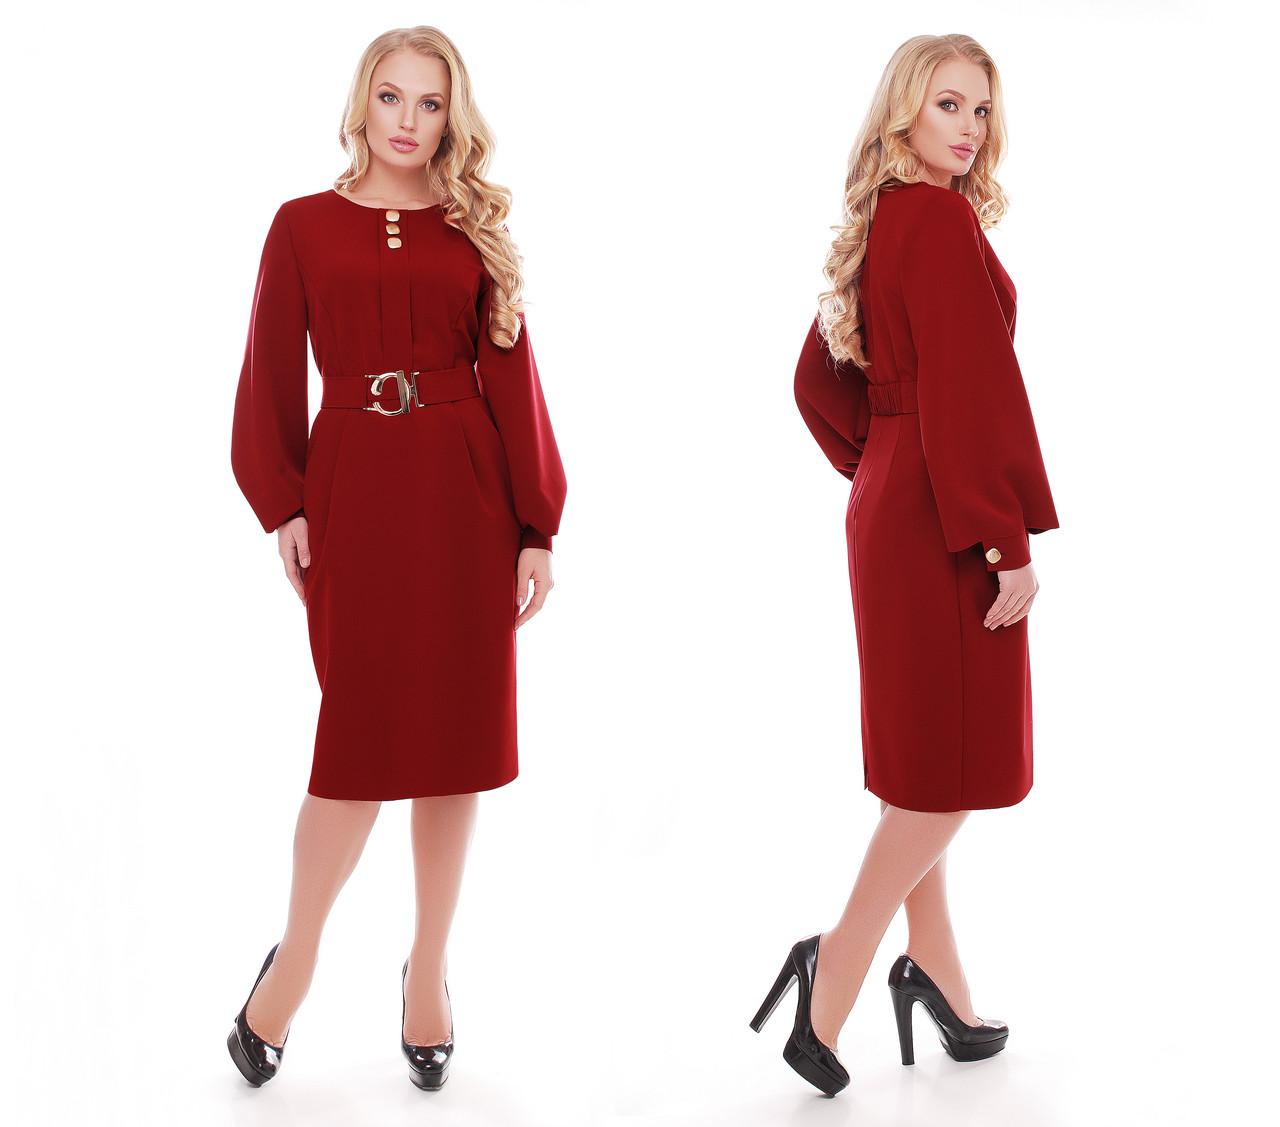 Элегантное платье женское Екатерина бордо